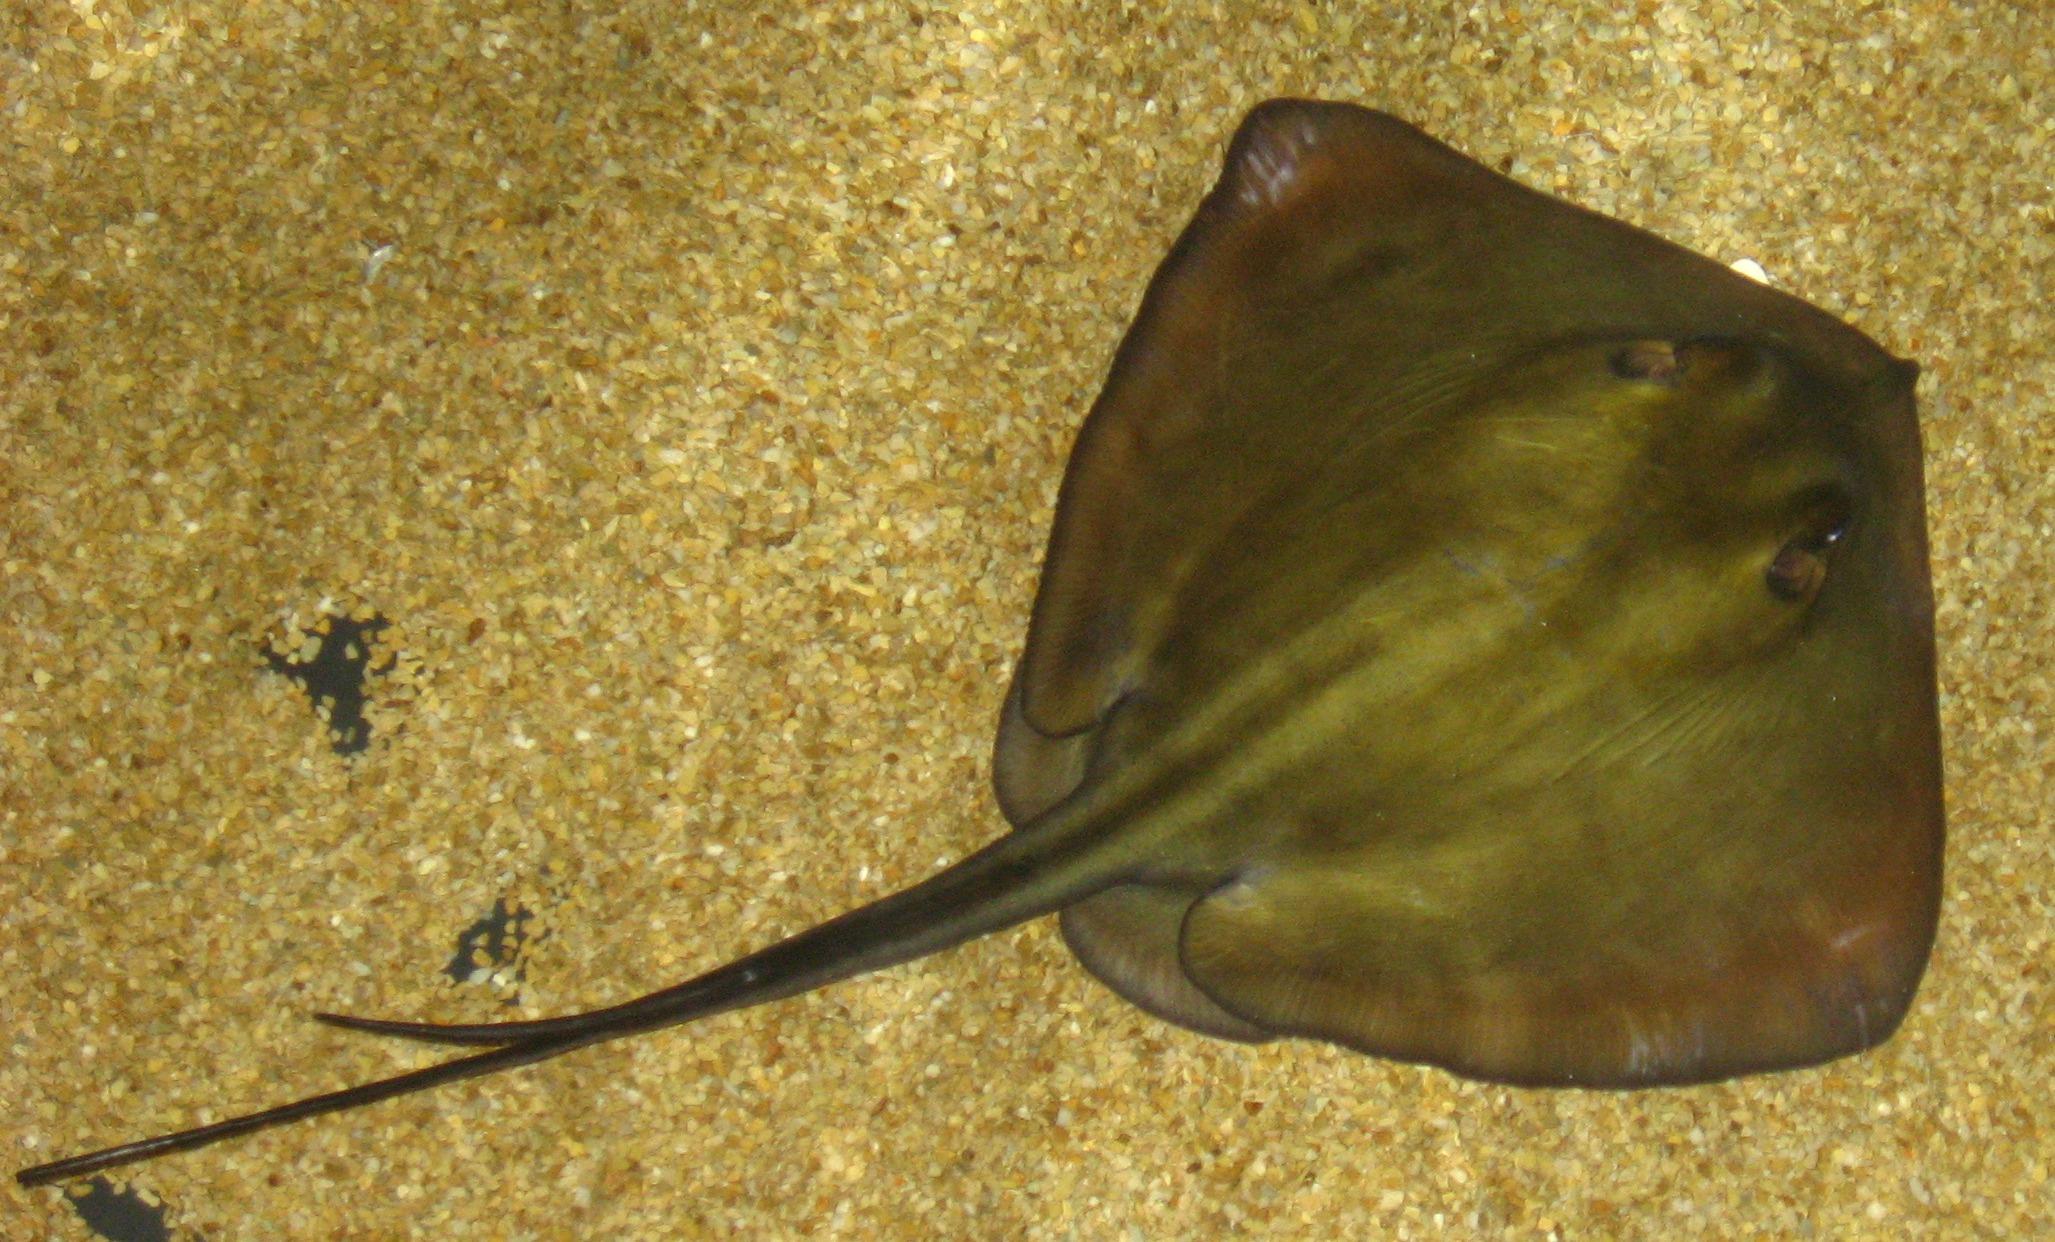 Fish that looks like a stingray 11